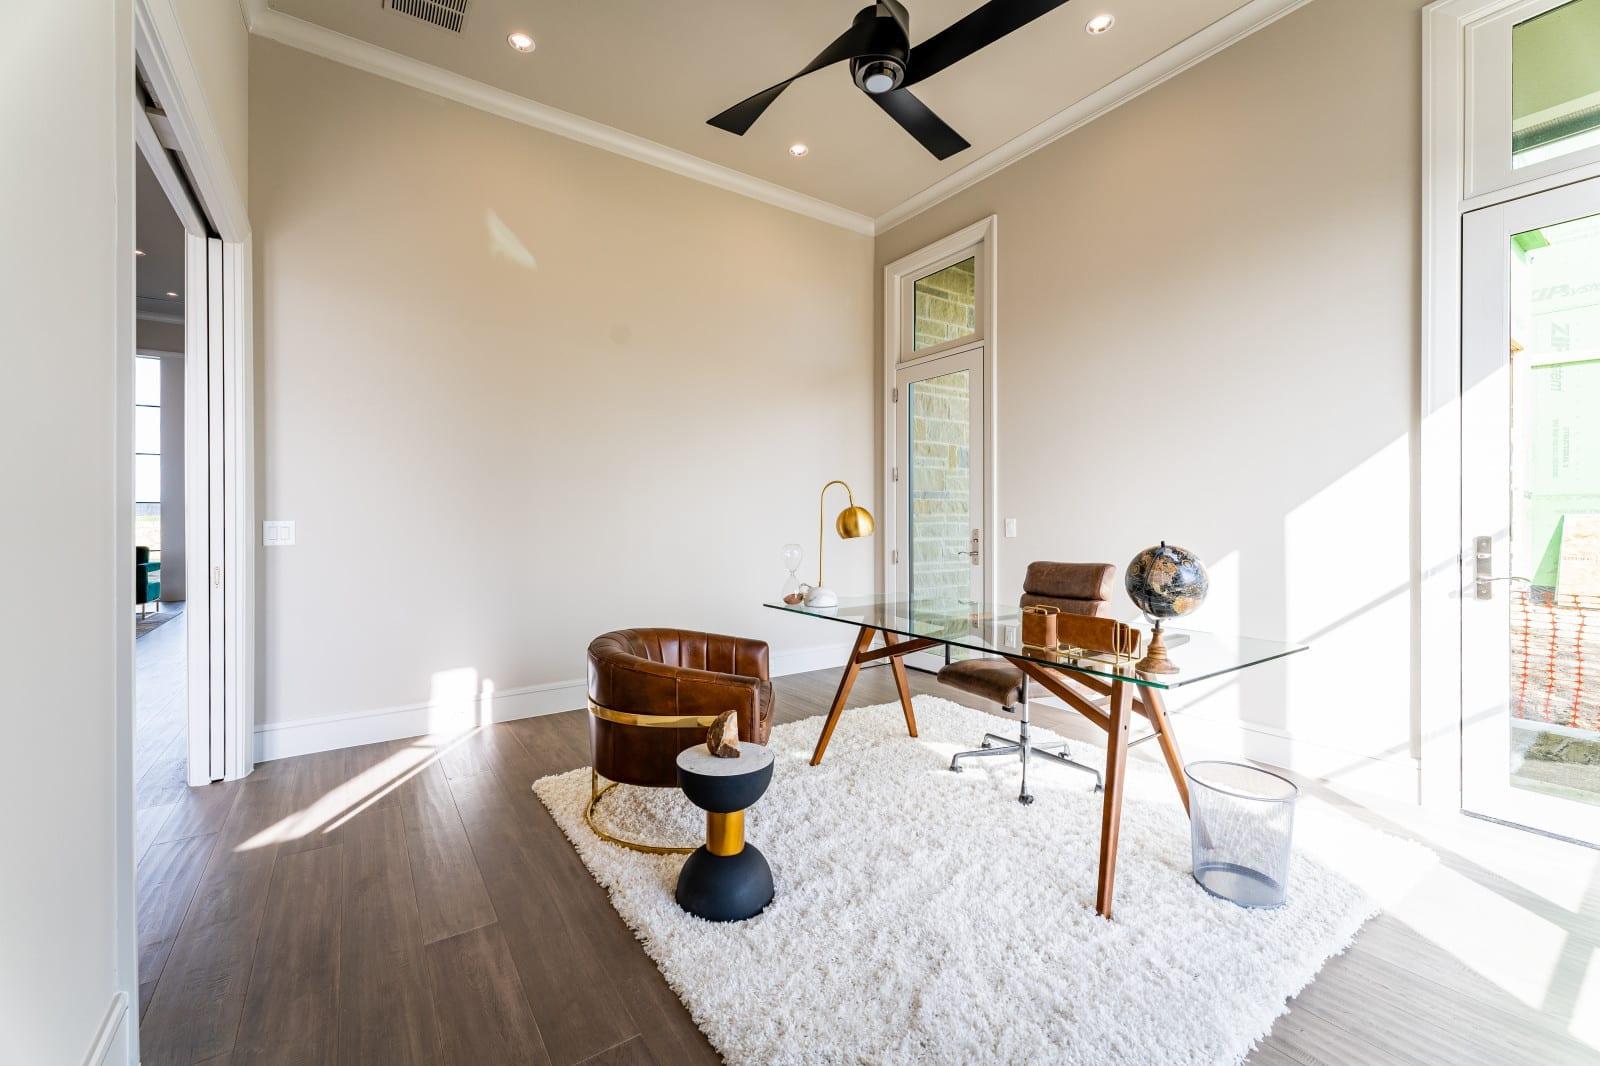 Modern Style Homes design # 9 - Millennial Design + Build